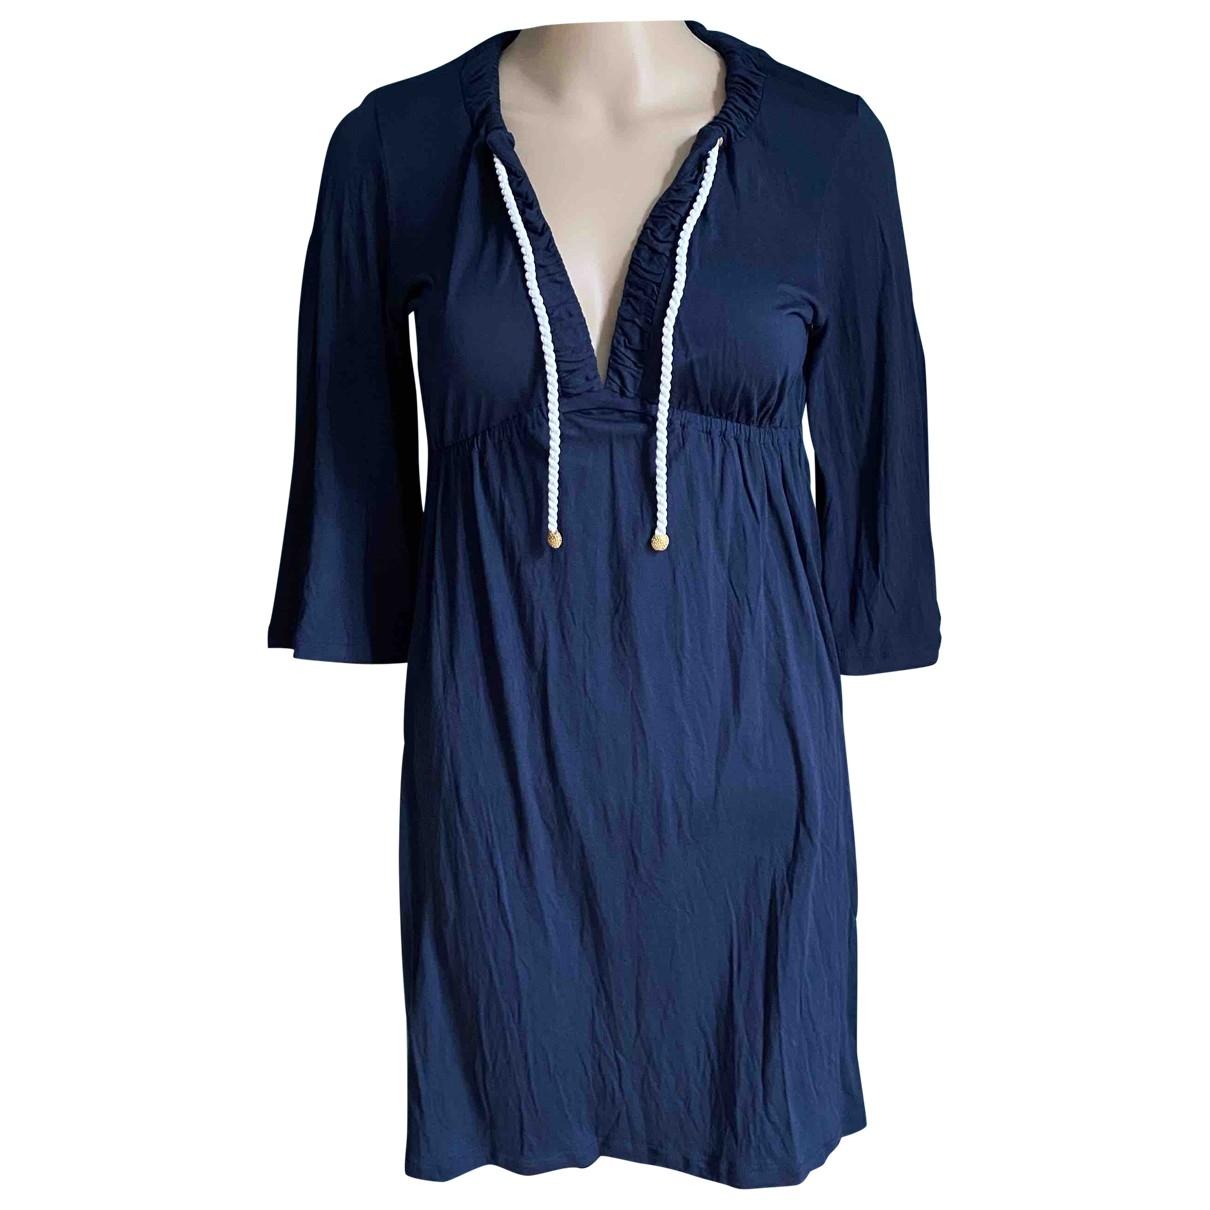 Heidi Klein \N Blue dress for Women S International